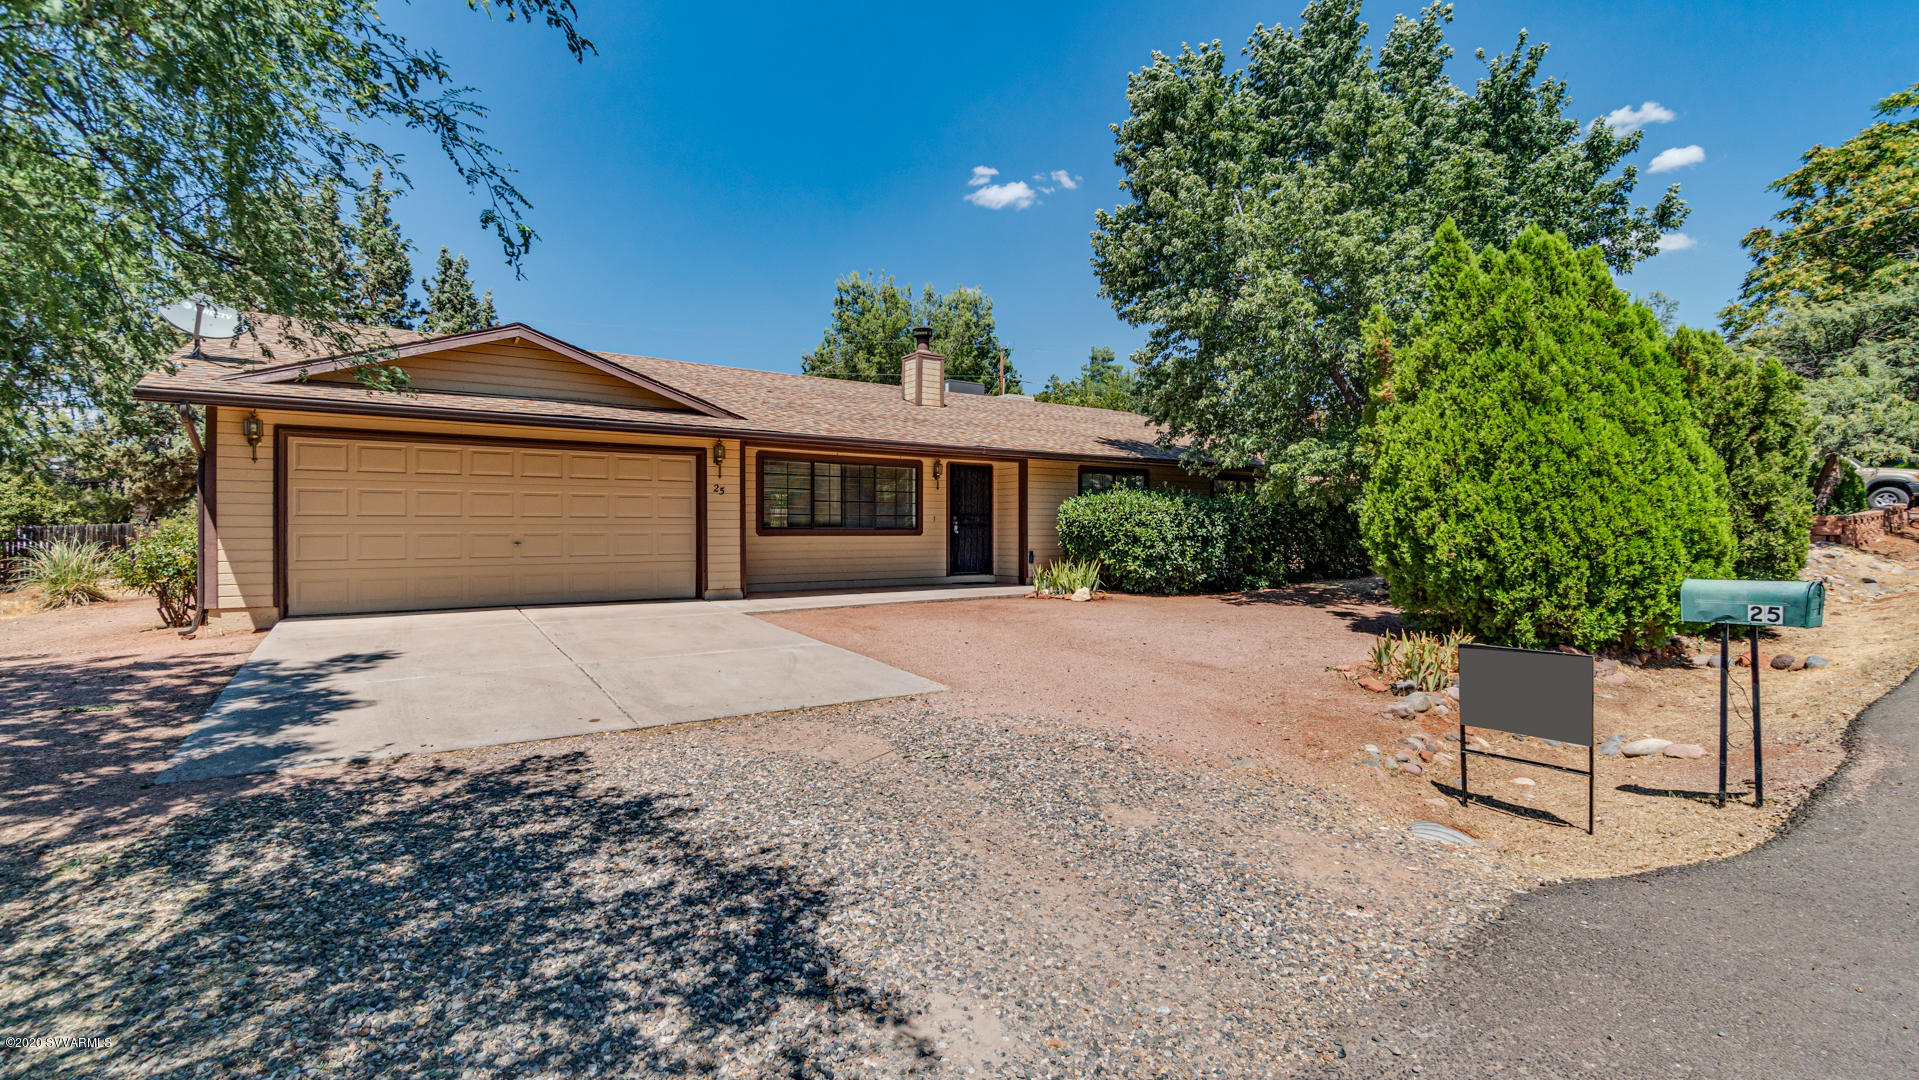 25 Wild Horse Mesa Drive Sedona, AZ 86351